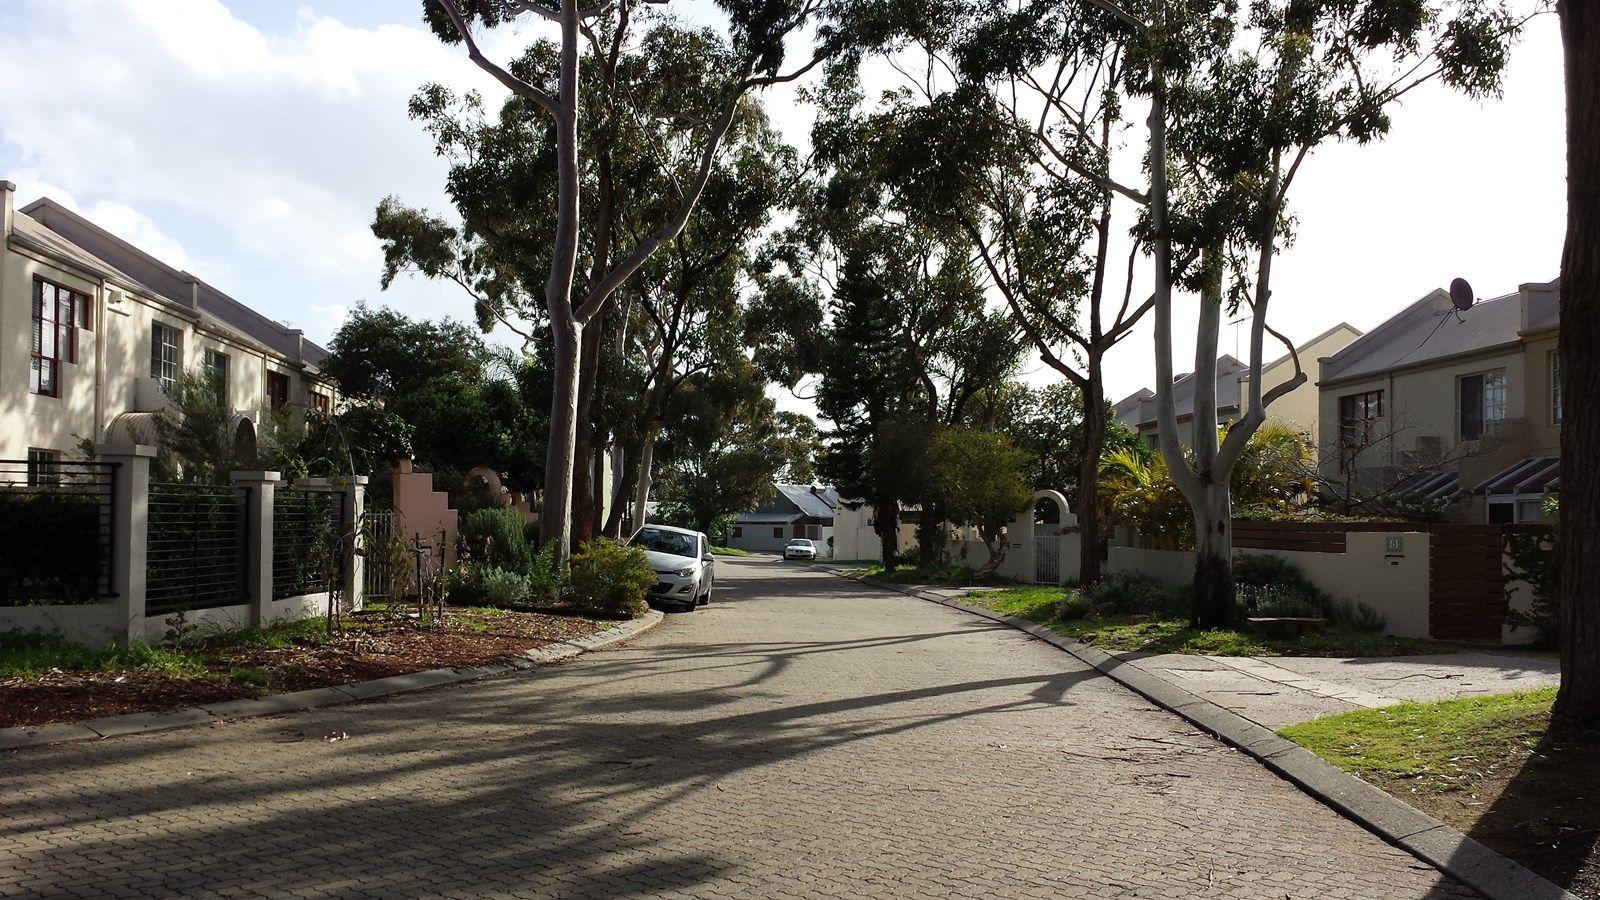 14/11 McAtee Court, Fremantle WA 6160, Image 8